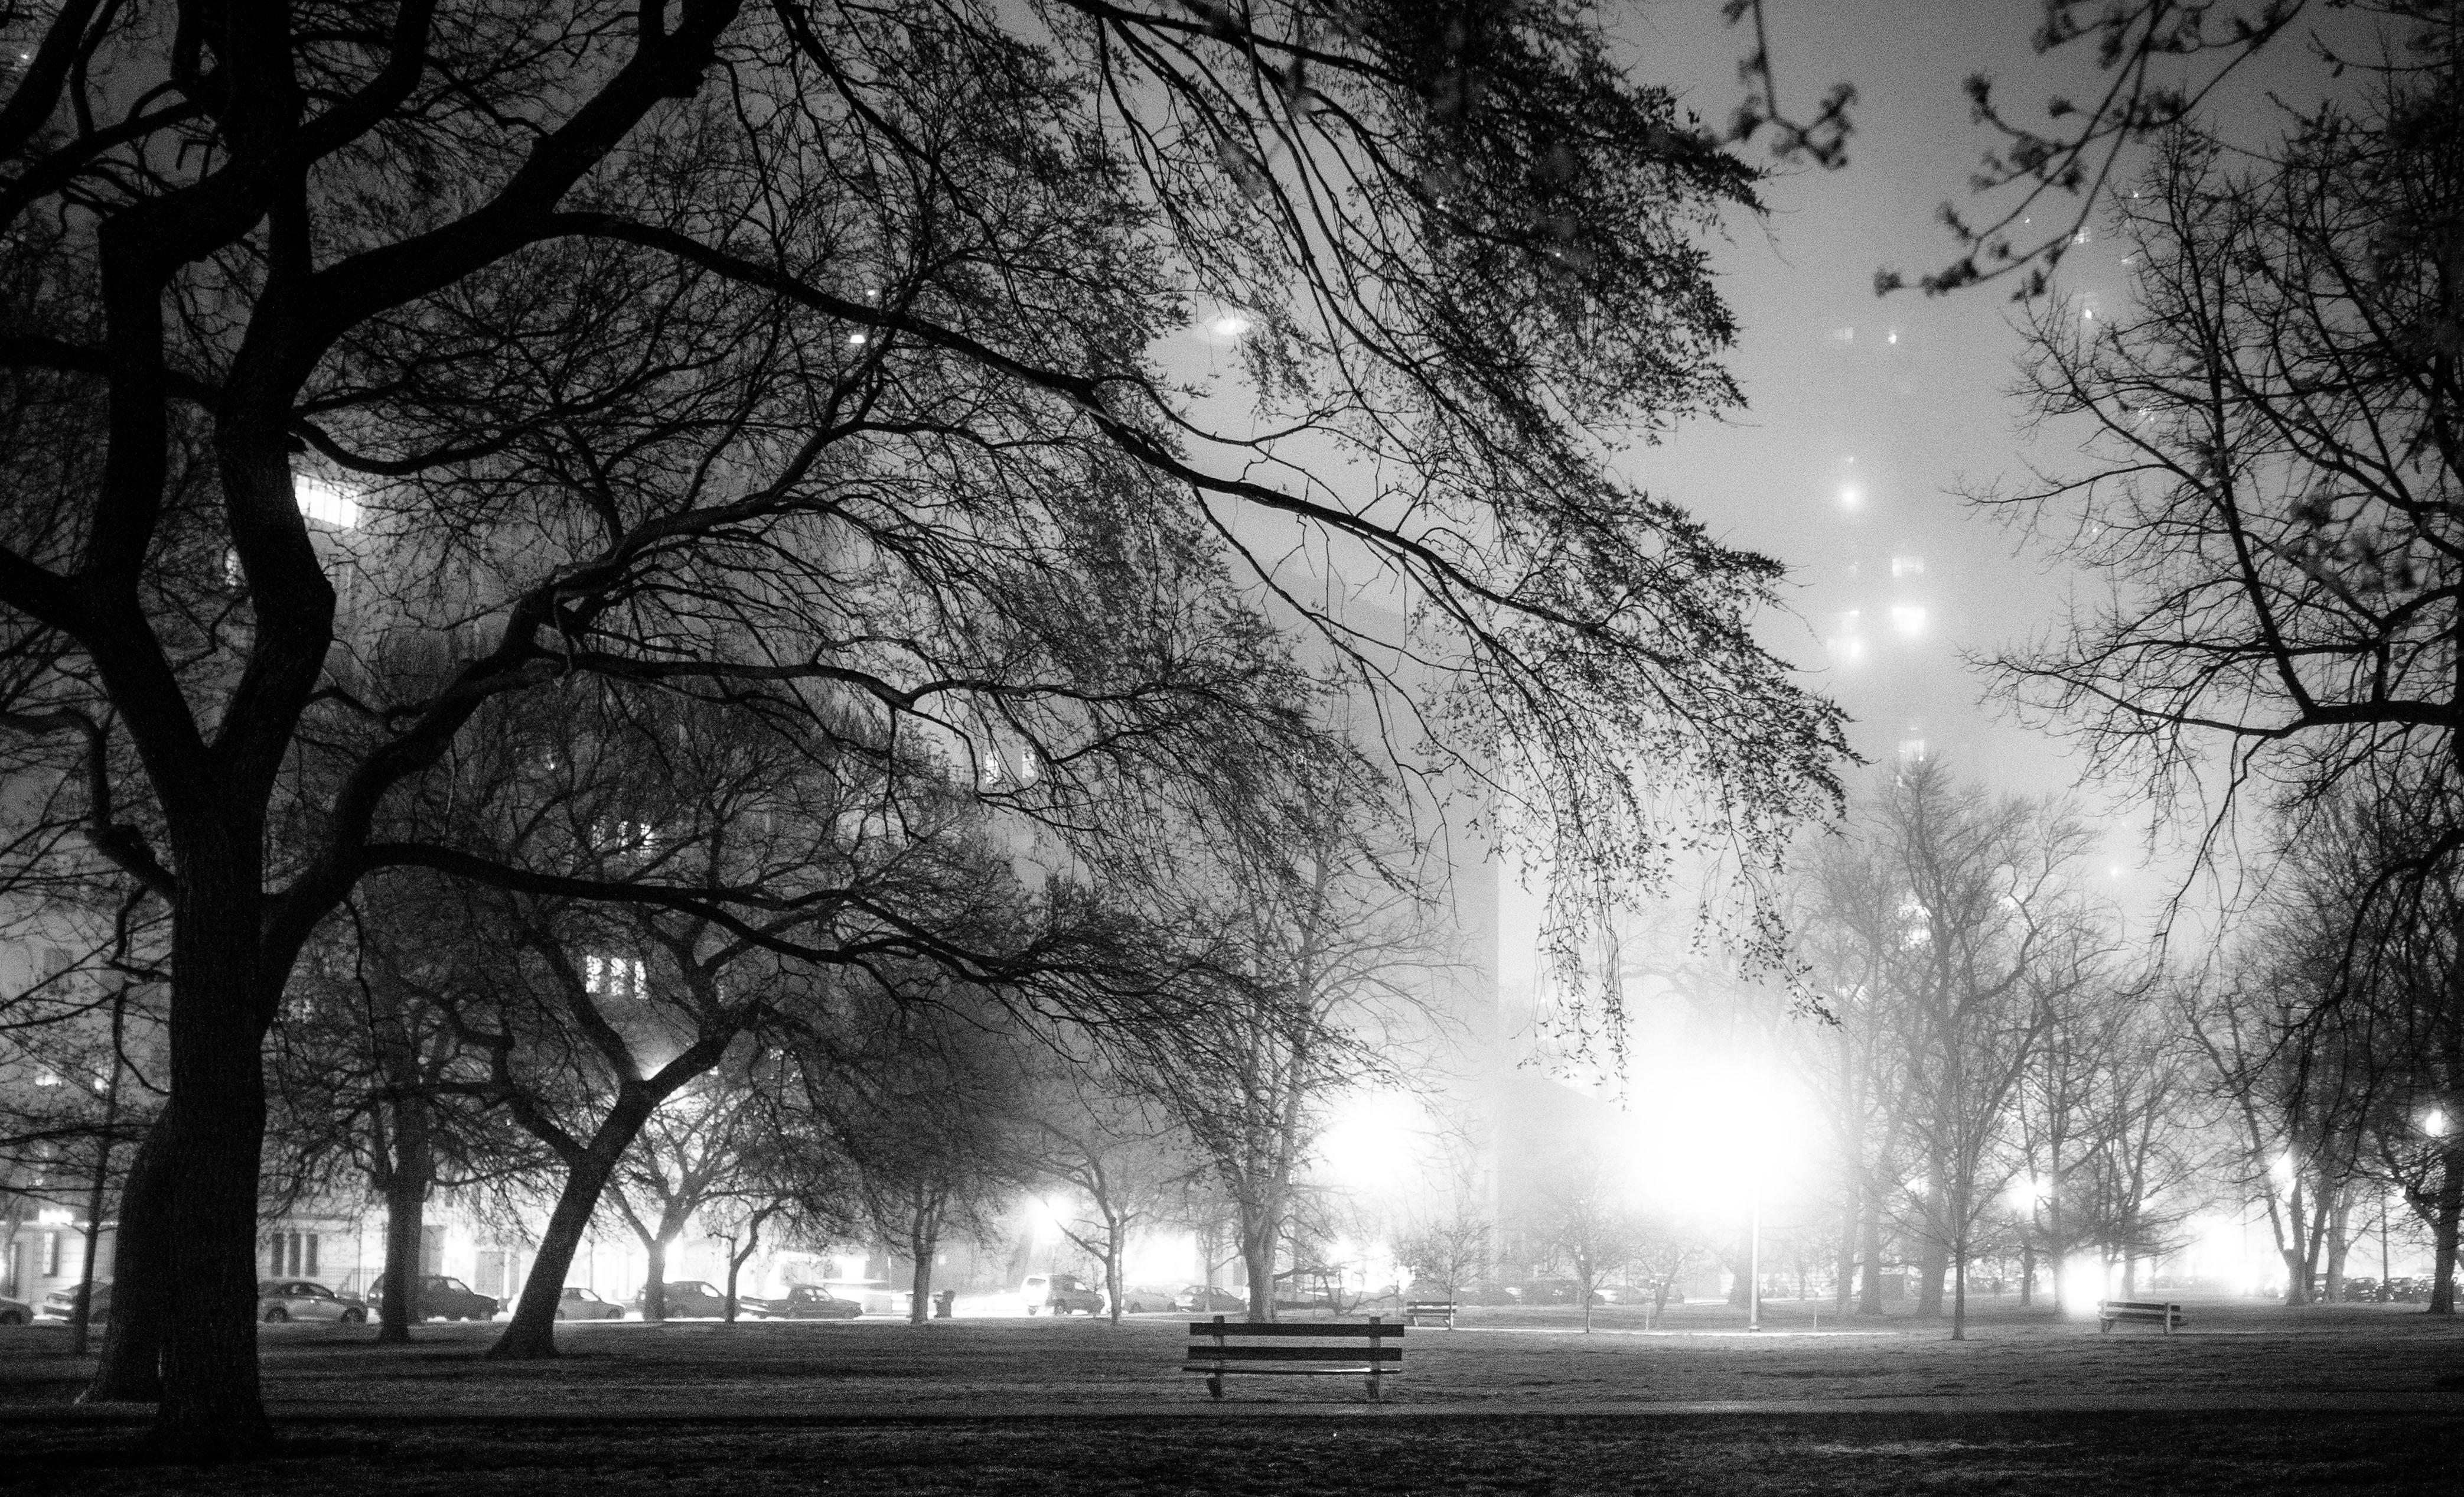 Lincoln Park Fog, Chicago, Nightfall in the Park w Street Lights Casting Shadows